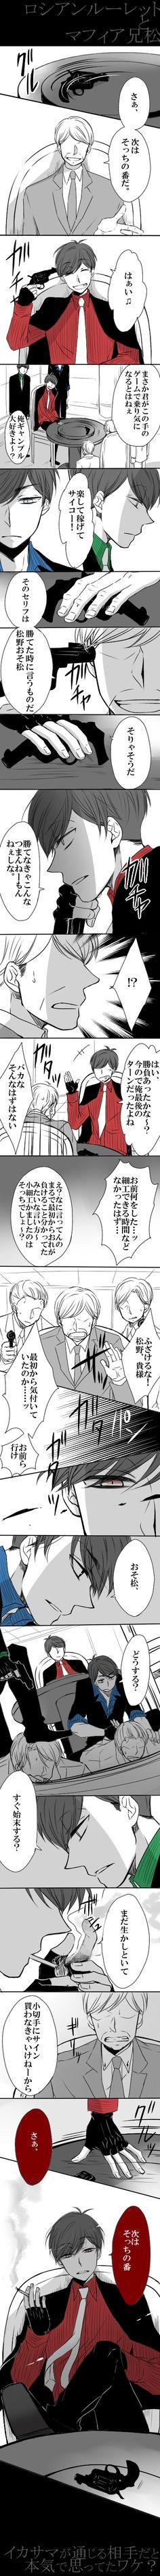 If only I understood what they were saying. Manga Boy, Manga Anime, Anime Art, Sakura Haruno, Osomatsu San Doujinshi, Reborn Katekyo Hitman, Ichimatsu, Howls Moving Castle, Narusasu